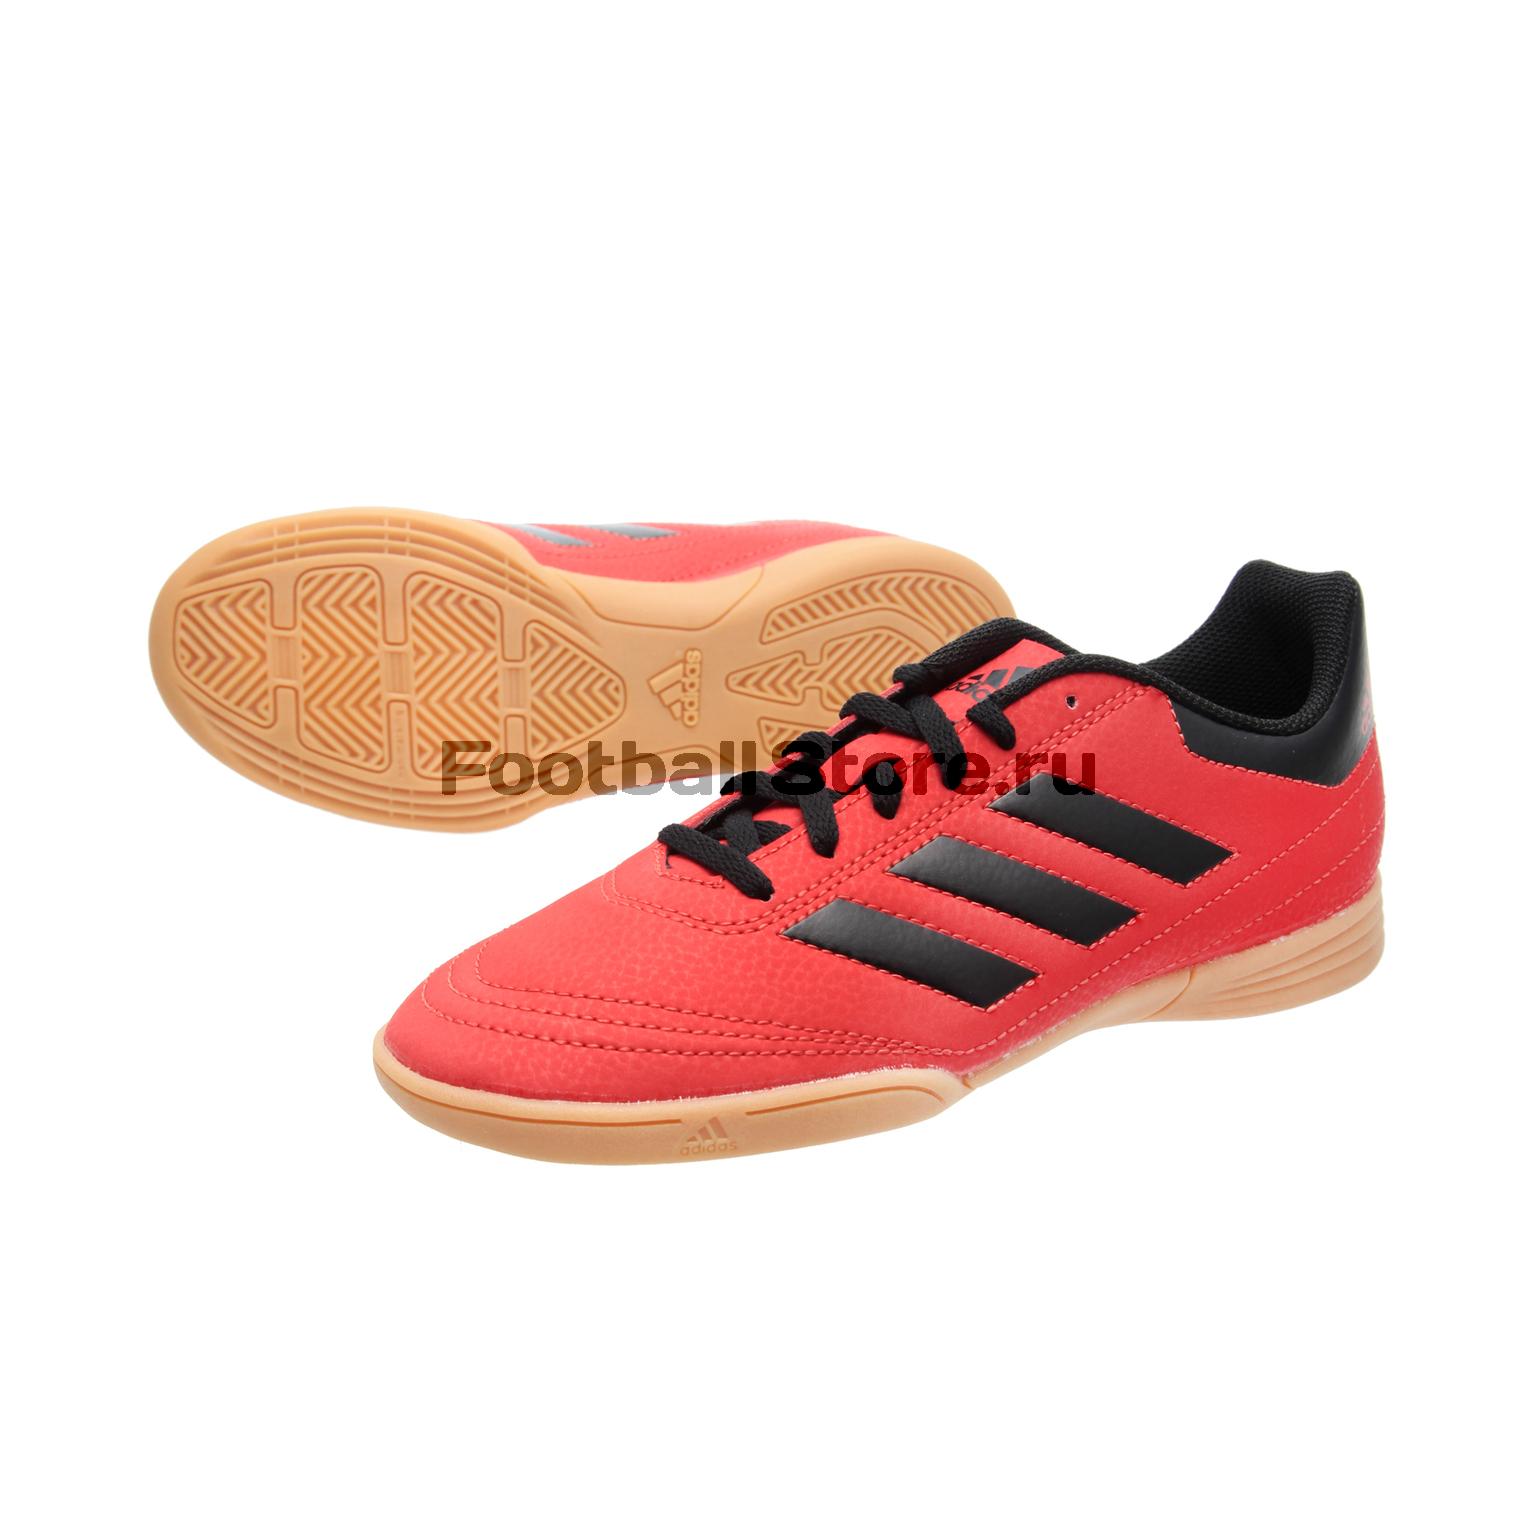 цена на Бутсы Adidas Обувь для зала Adidas Goletto VI IN JR S81099